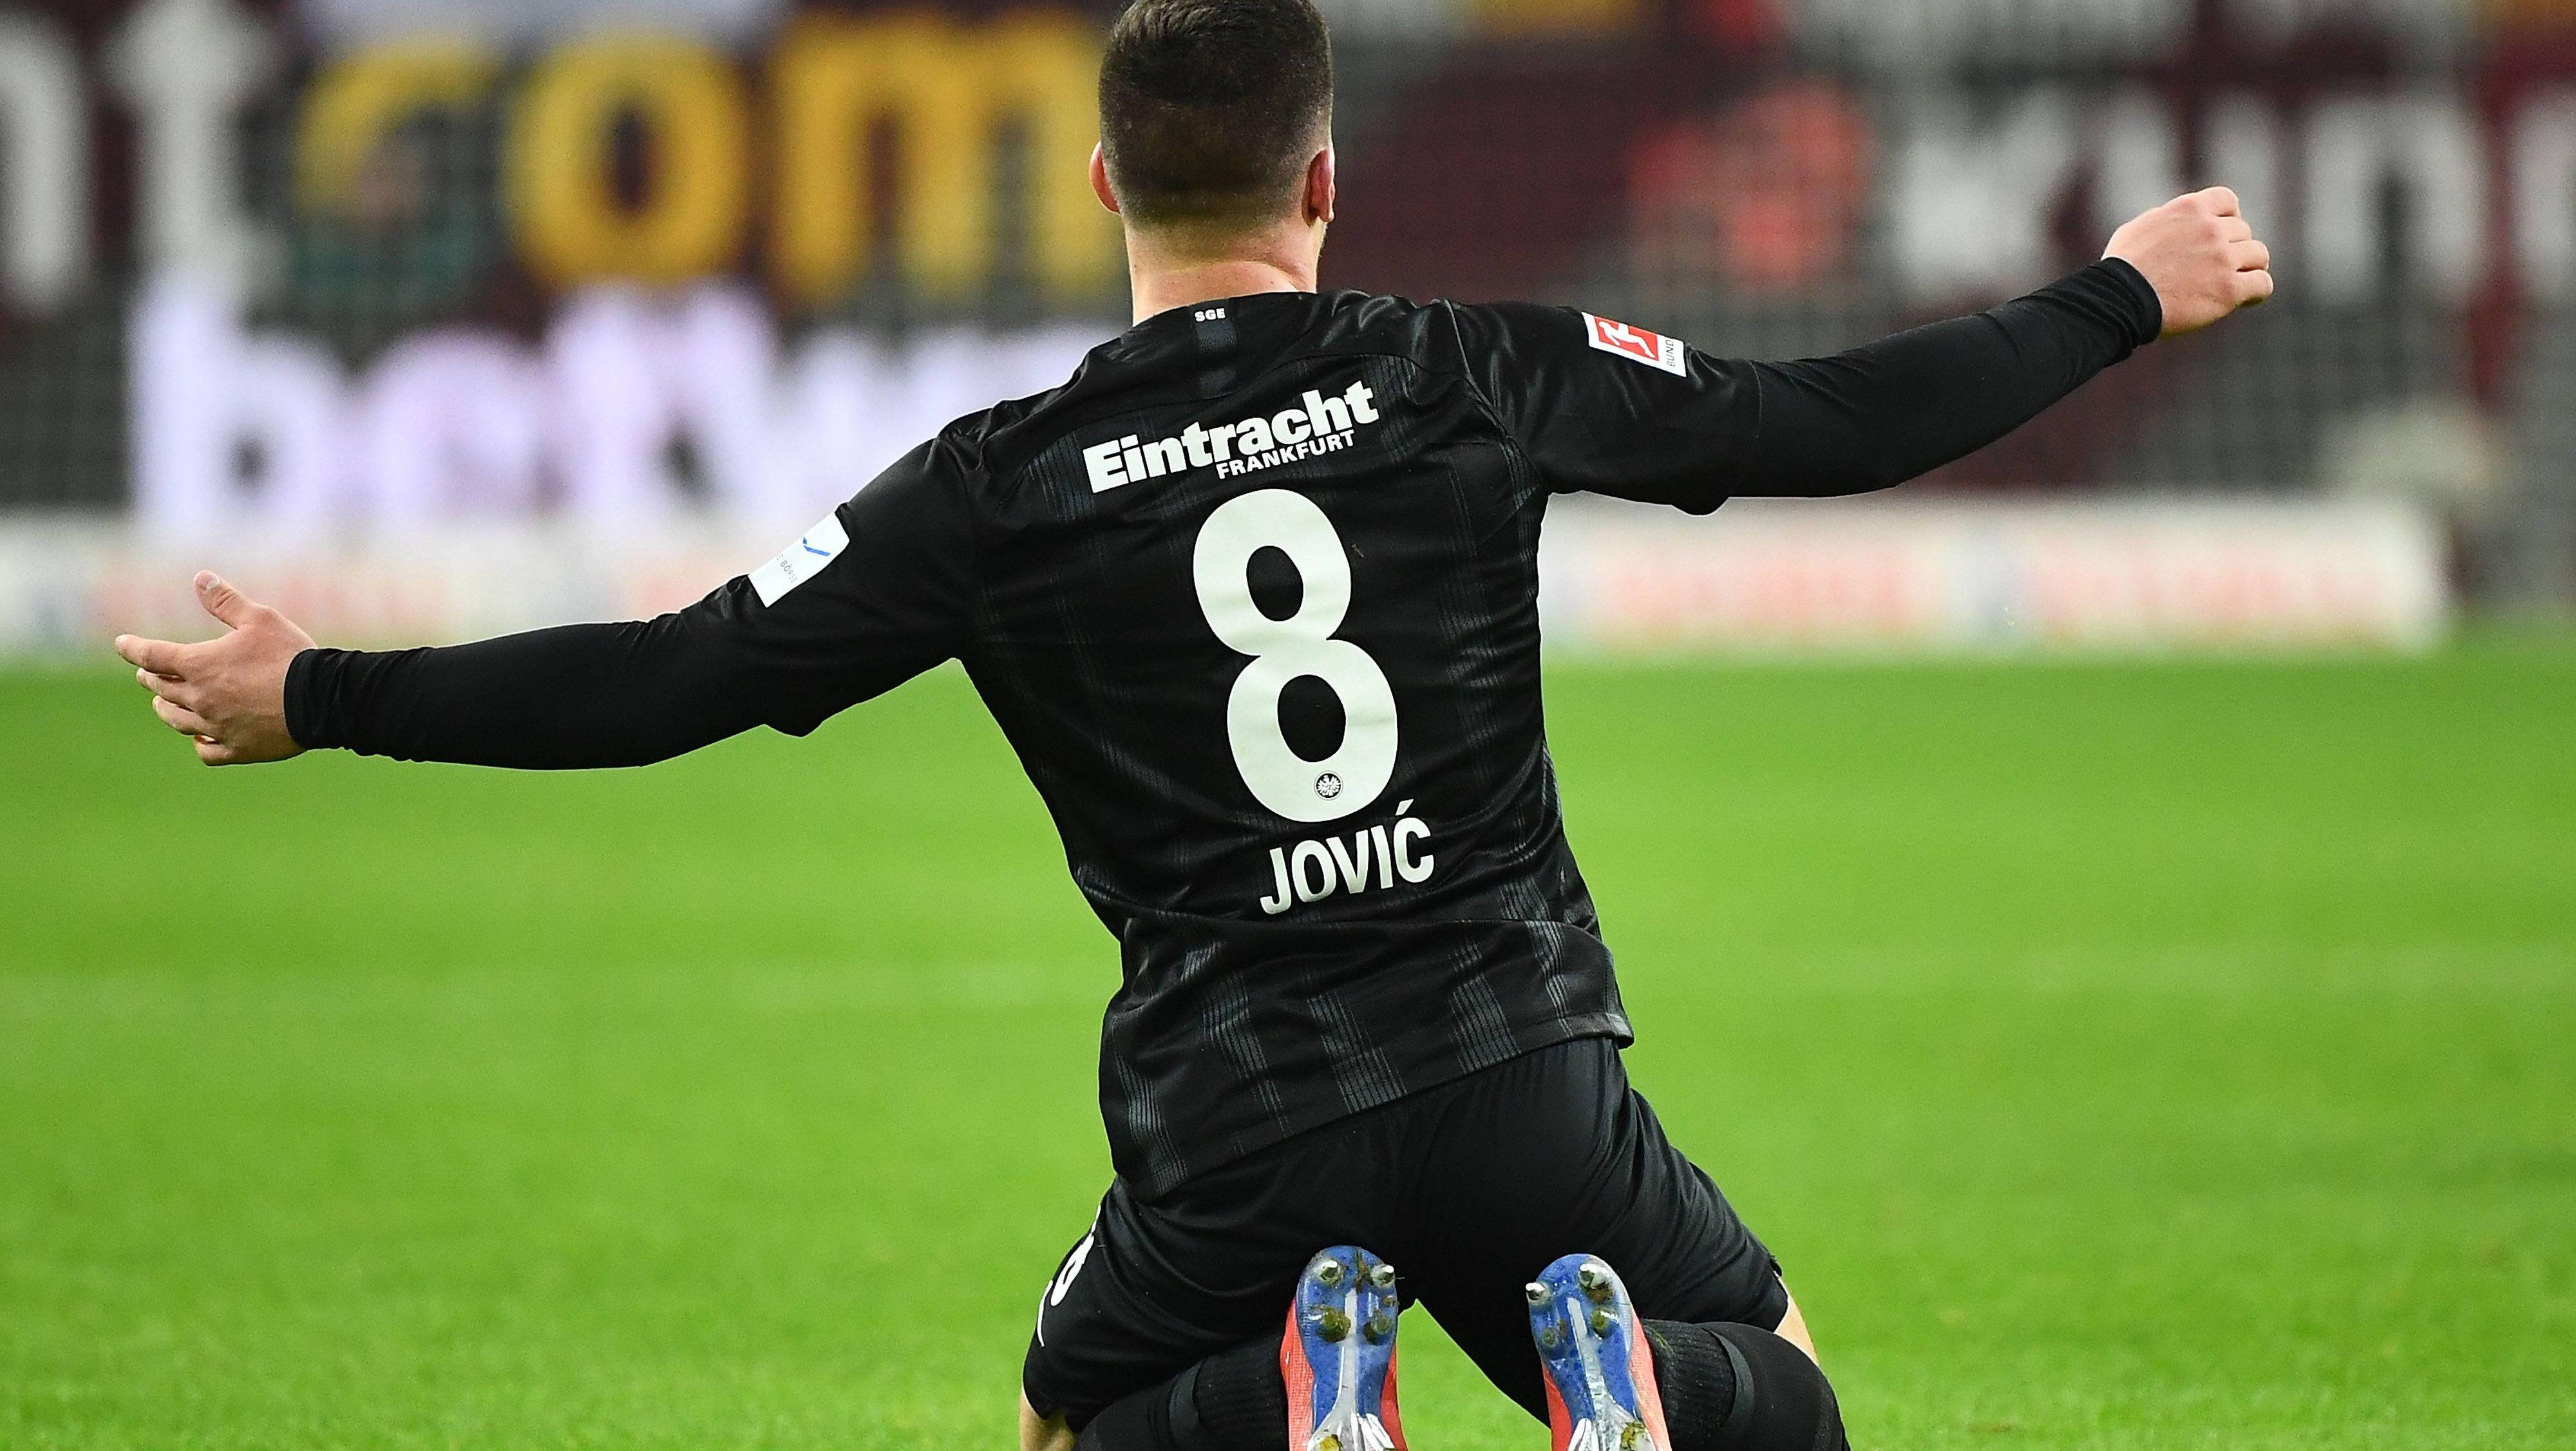 """Enormes Potenzial"": Jovic lässt Taten sprechen"